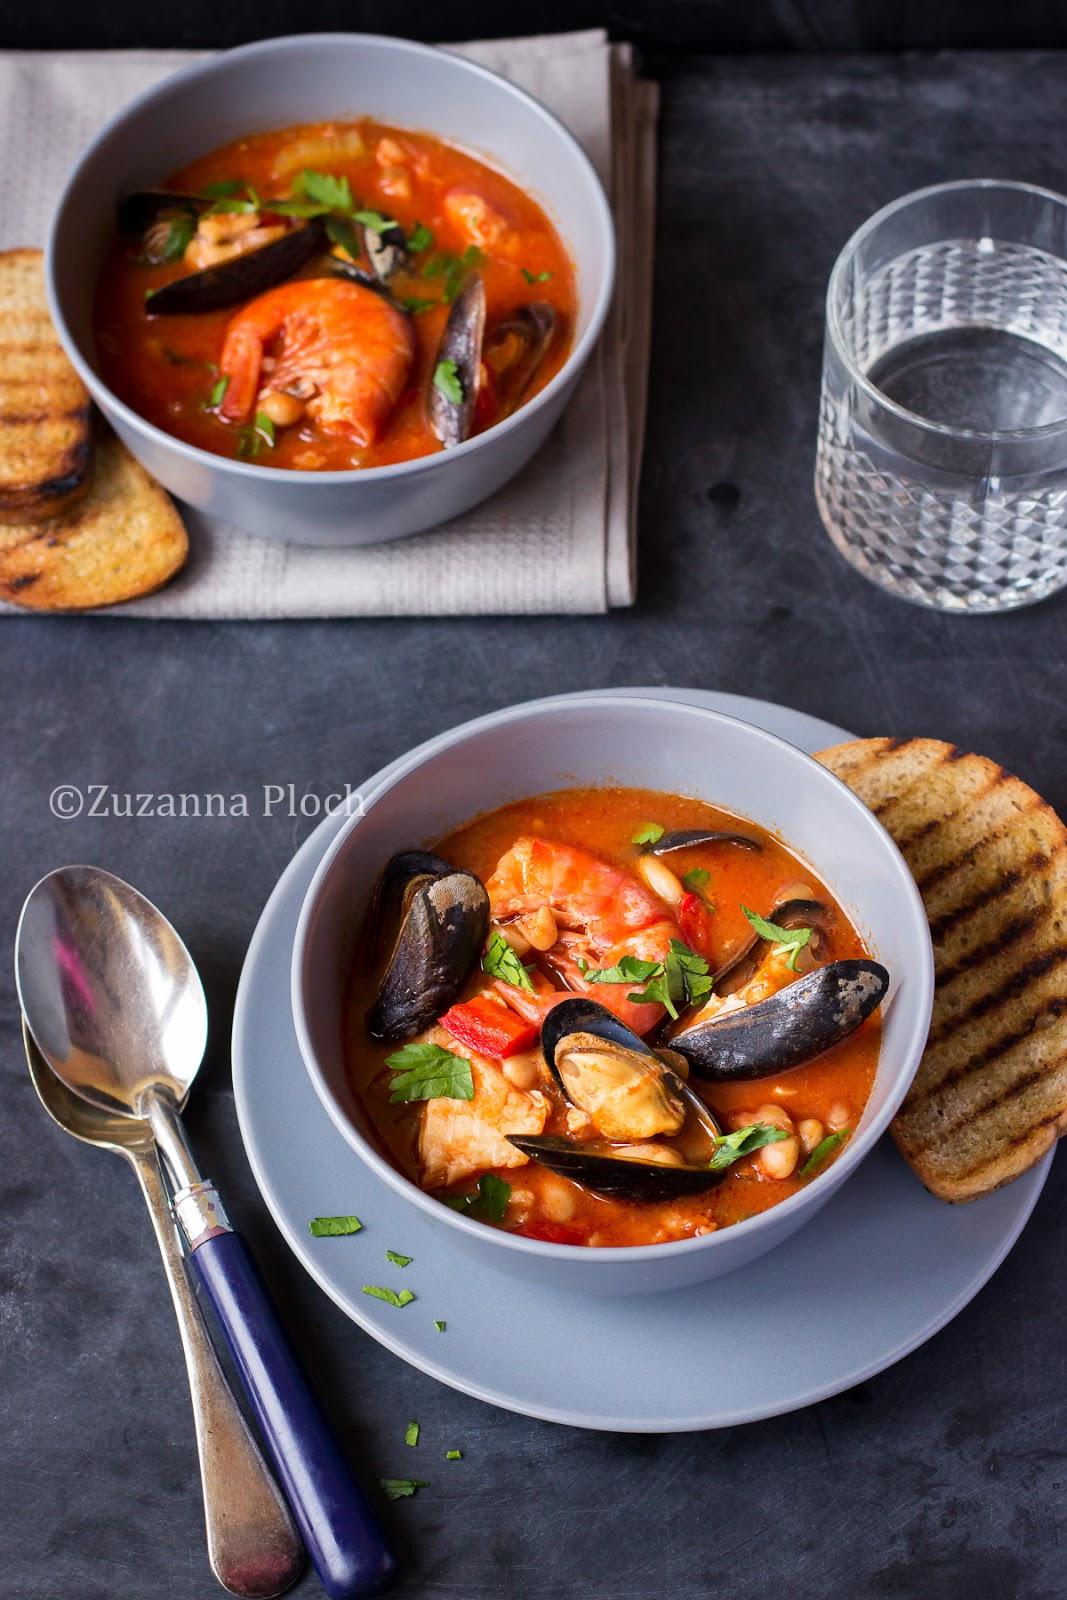 Seafood soup - Food photography by Zuzanna Ploch, fotografia kulinarna